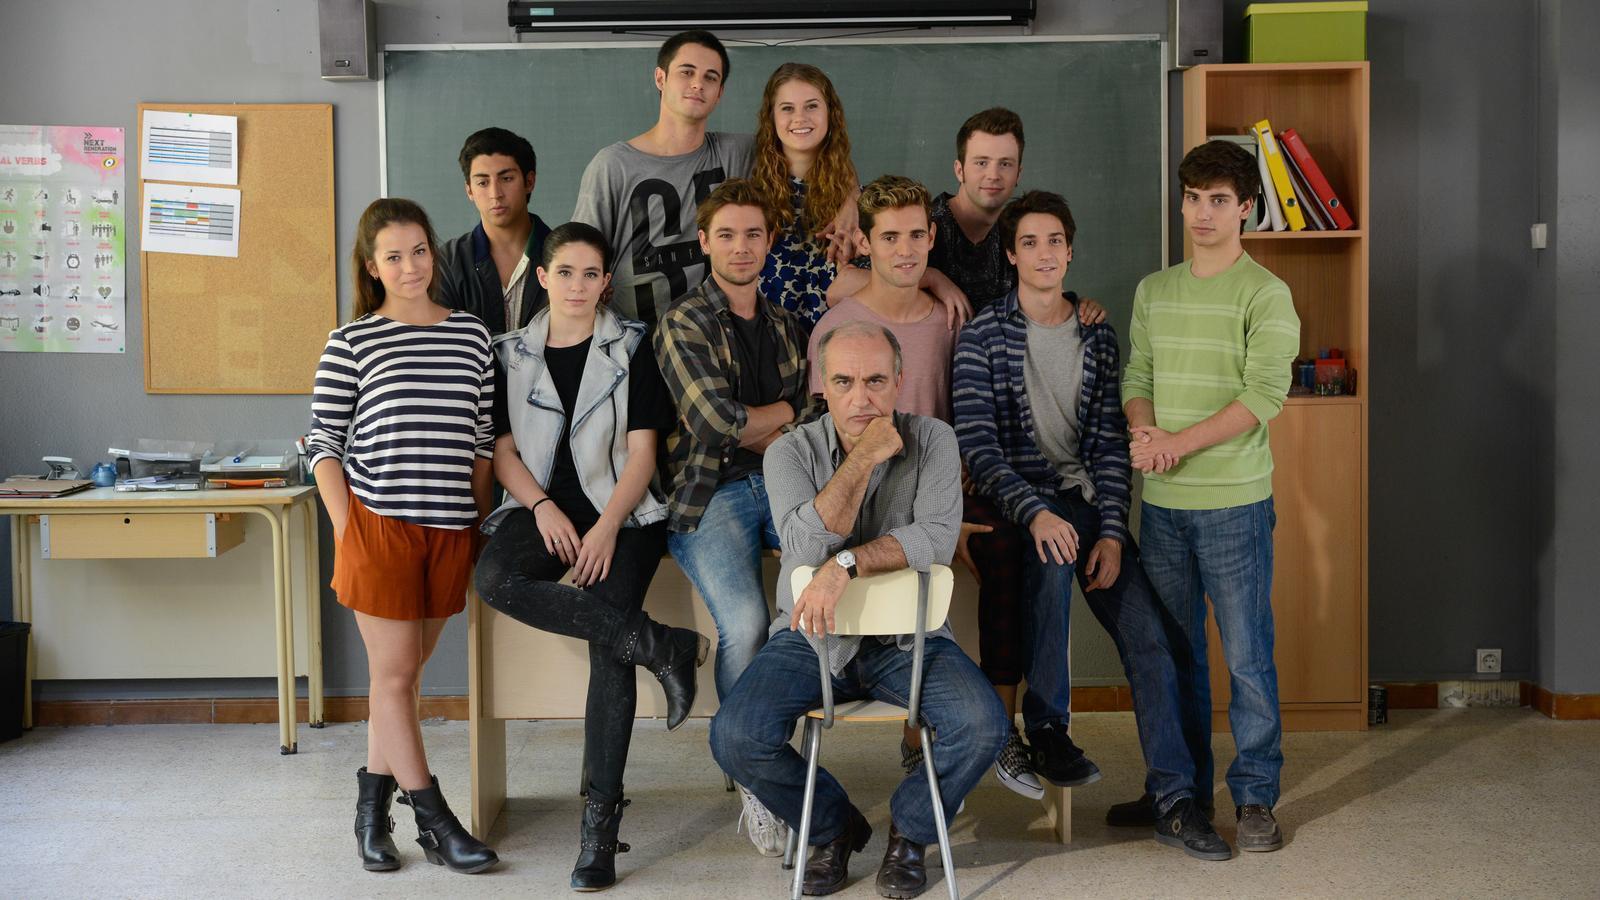 La primera temporada de 'Merlí' arriba a Playz